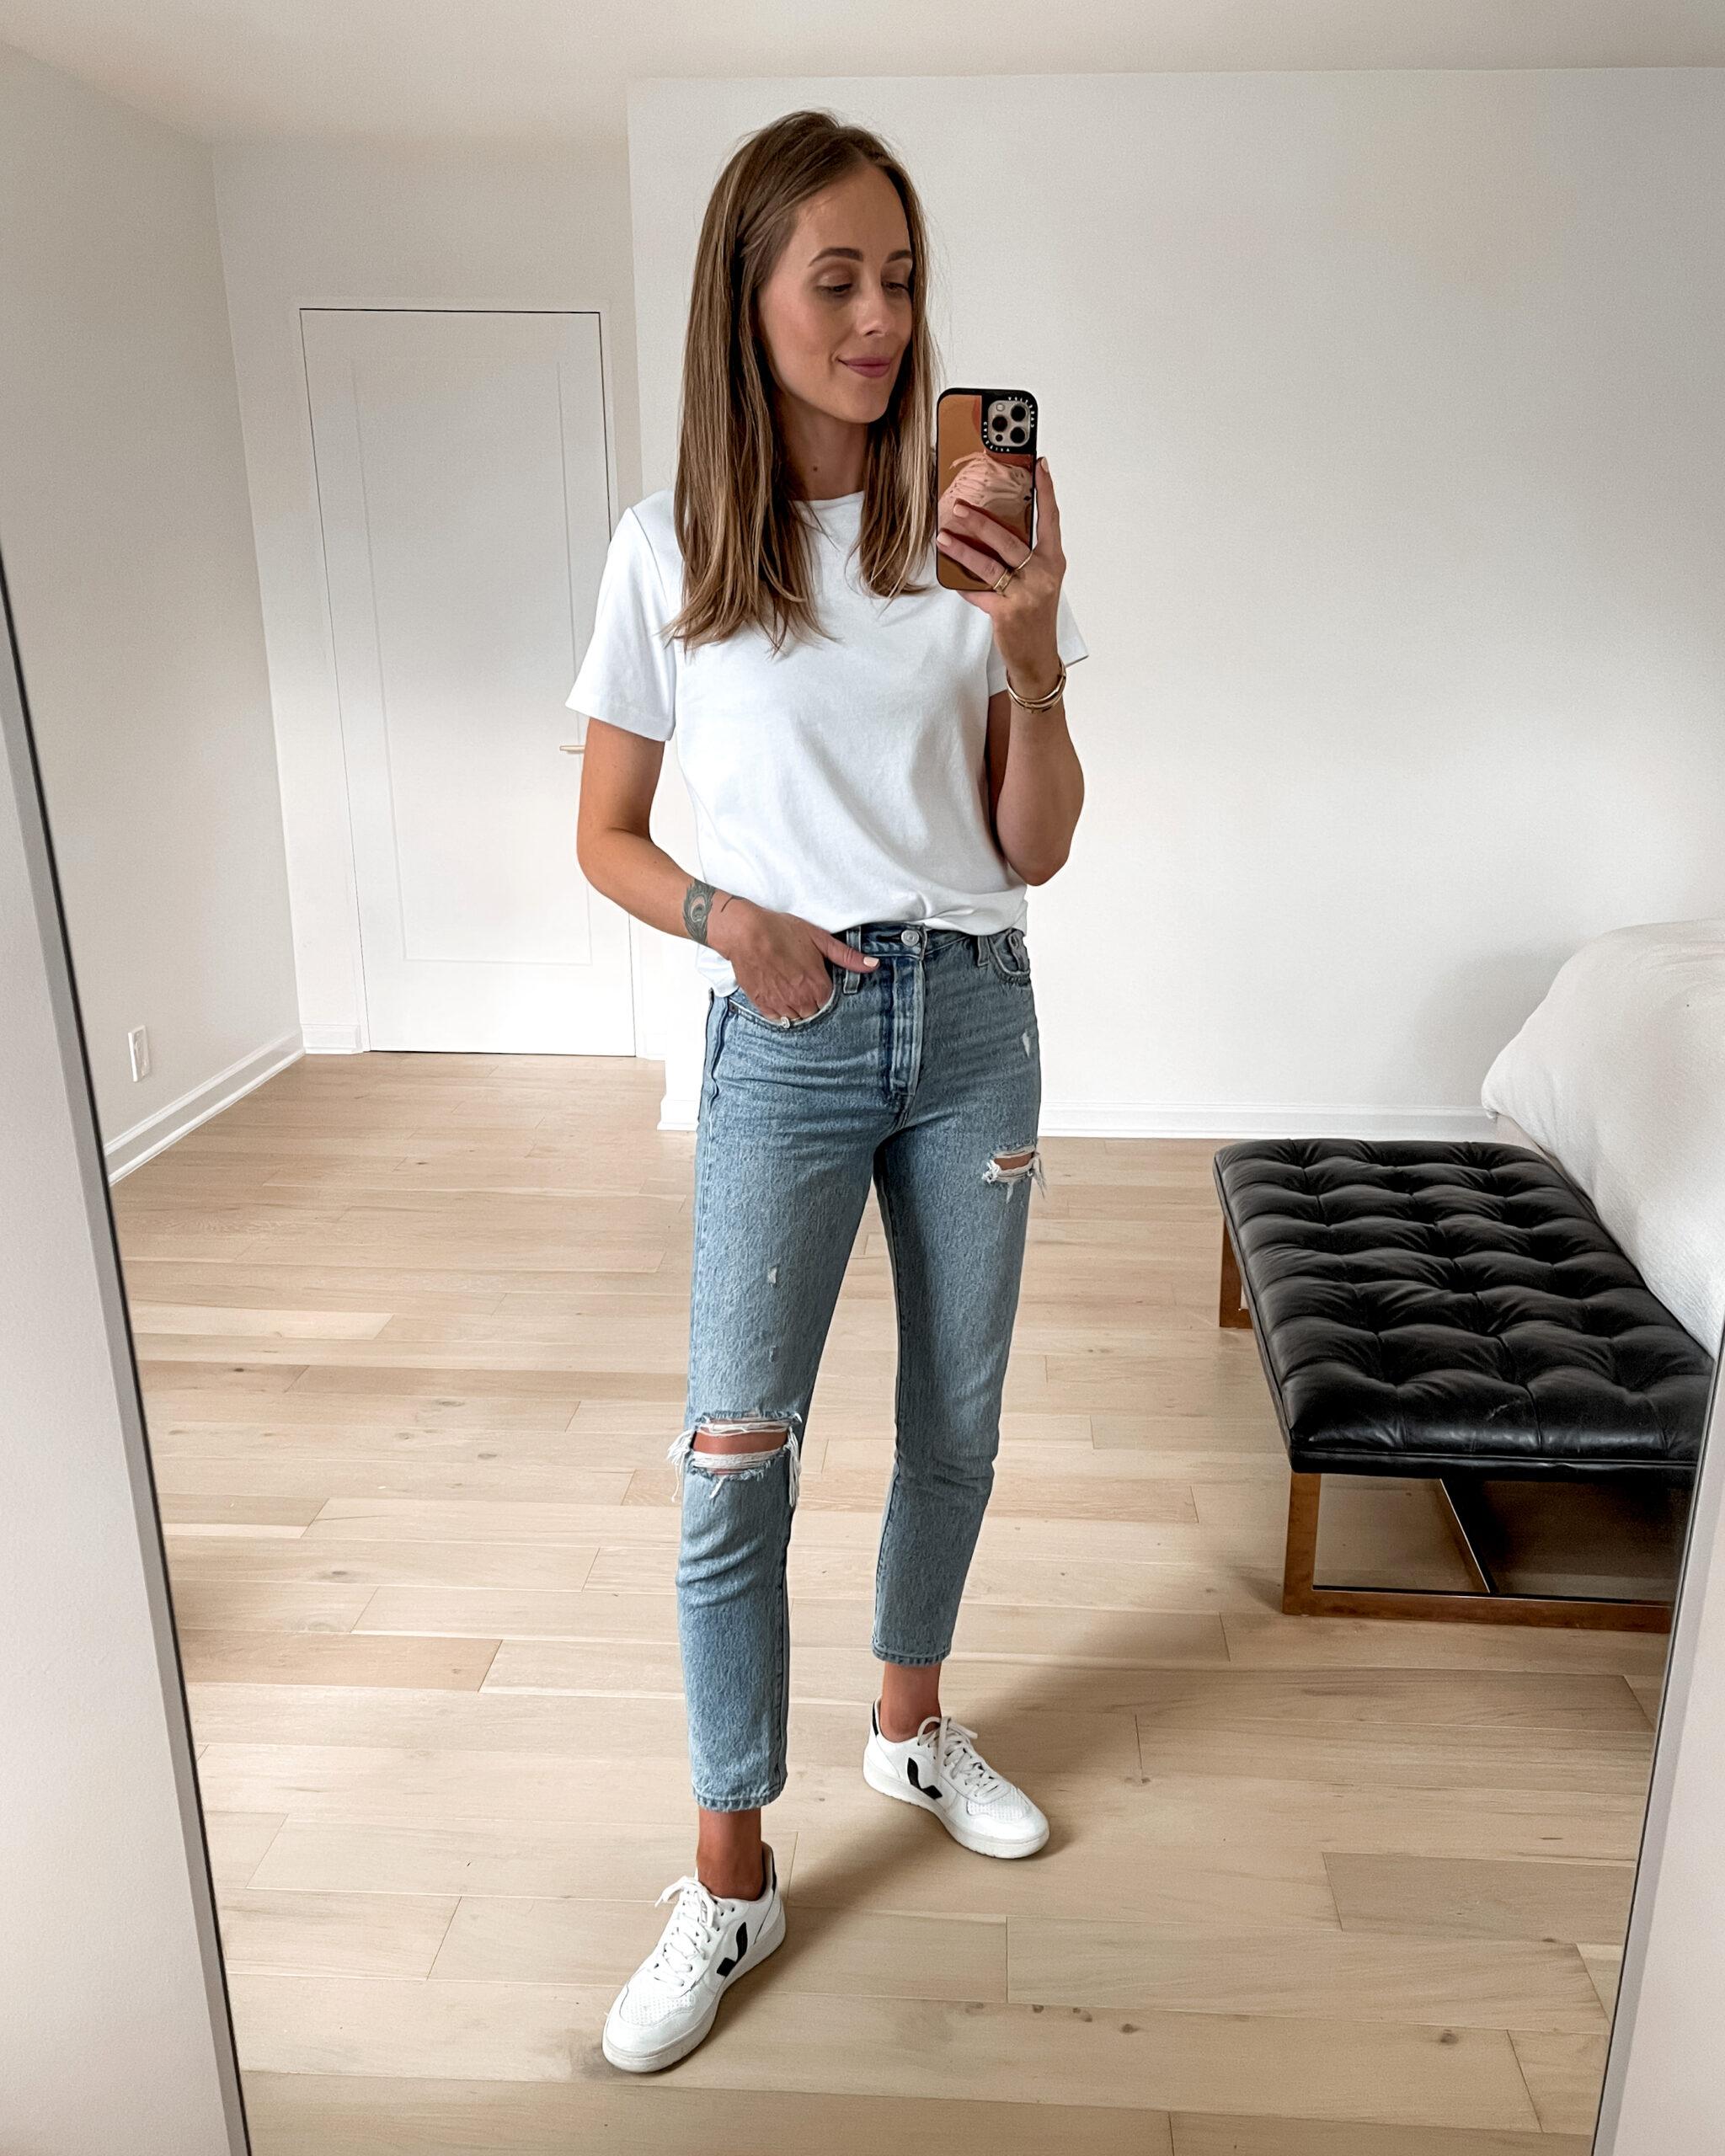 Fashion Jackson Amazon Fashion Made For You Relaxed White Crewneck Tshirt